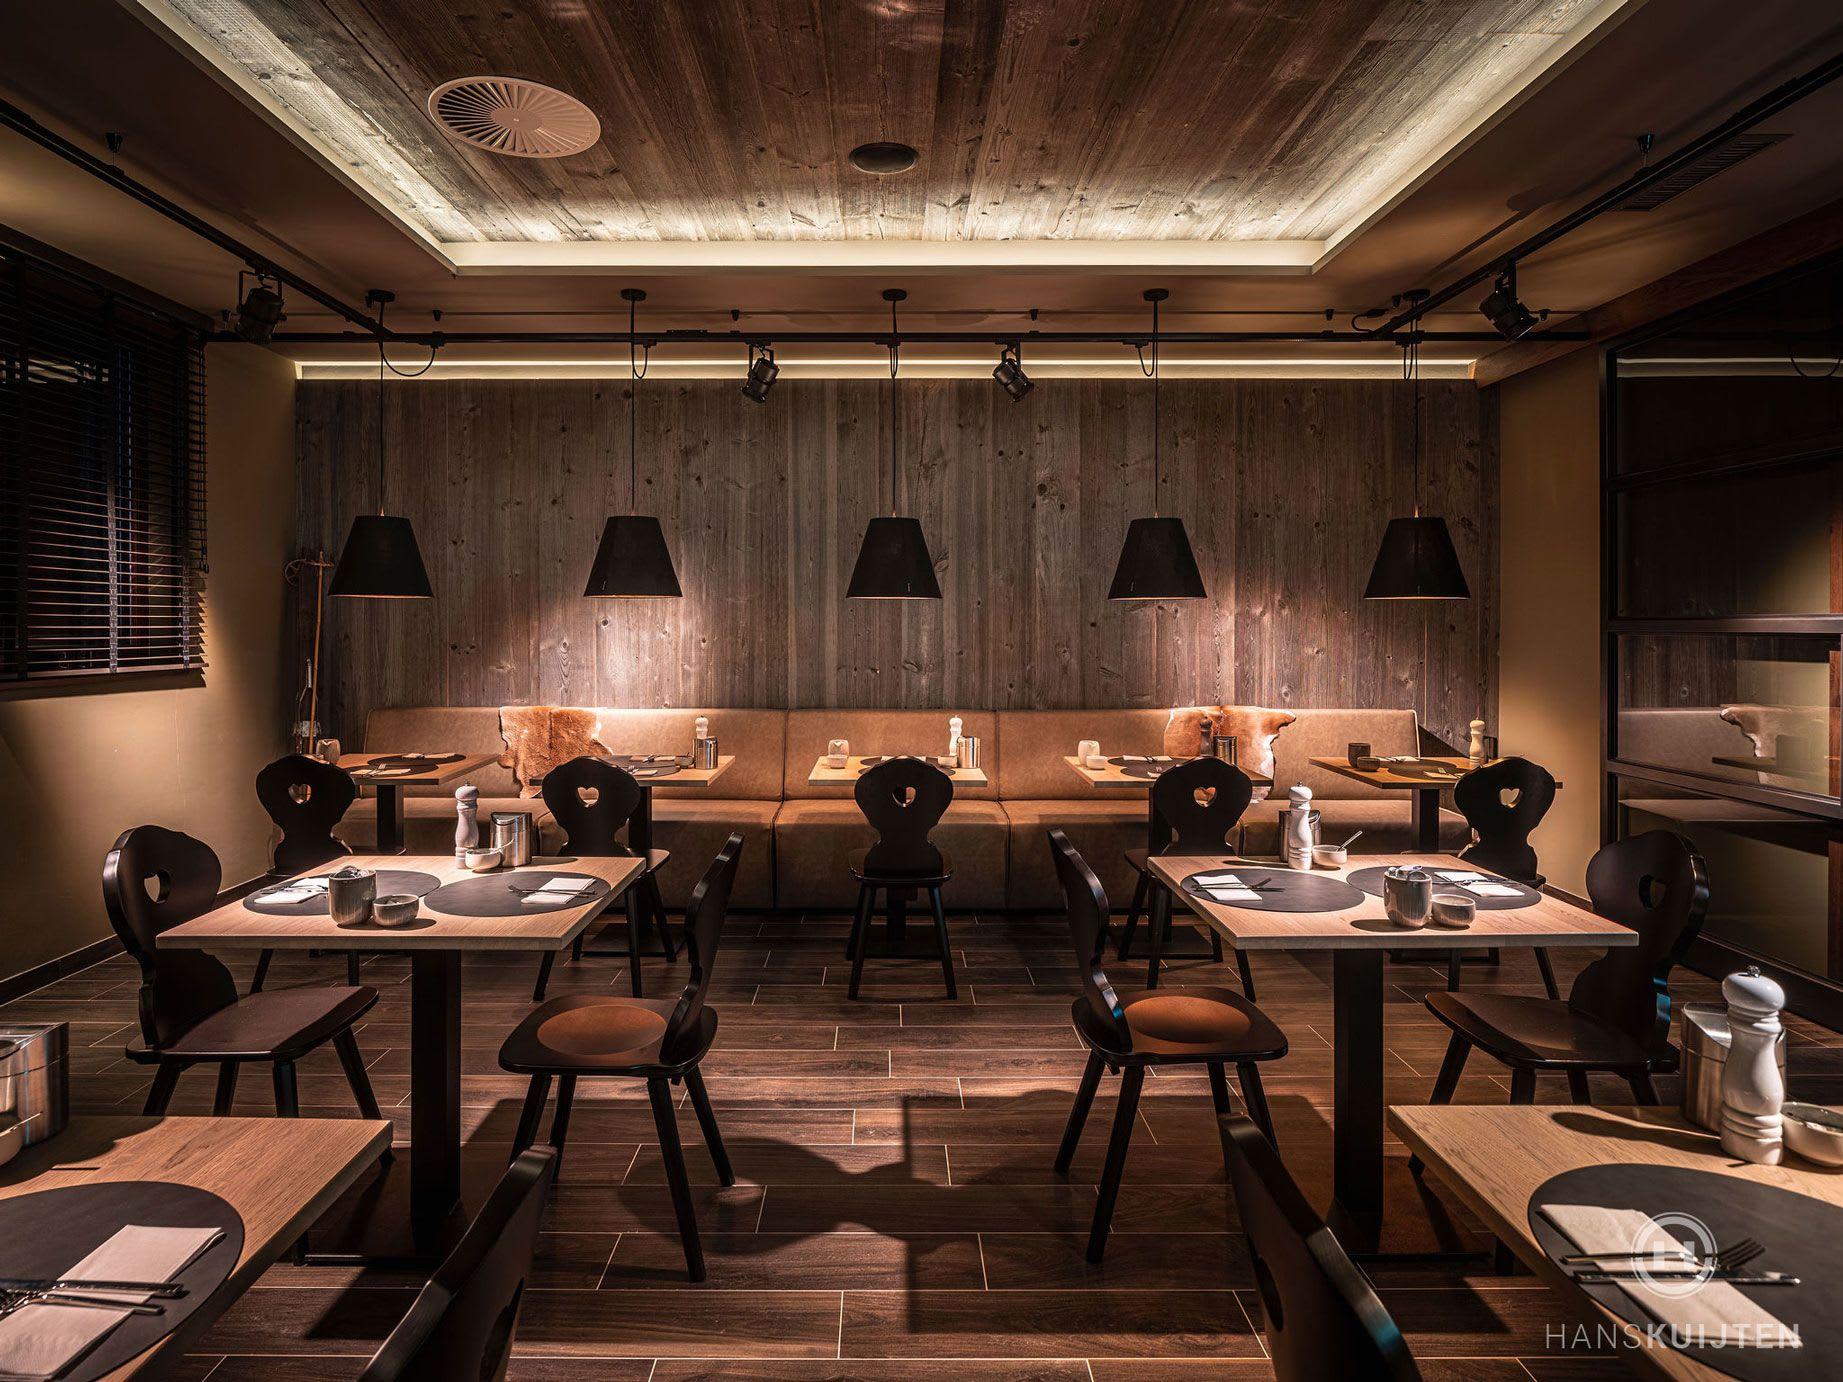 Interior Design by Hans Kuijten seen at Austria - Pure Resort Warth-Arlberg